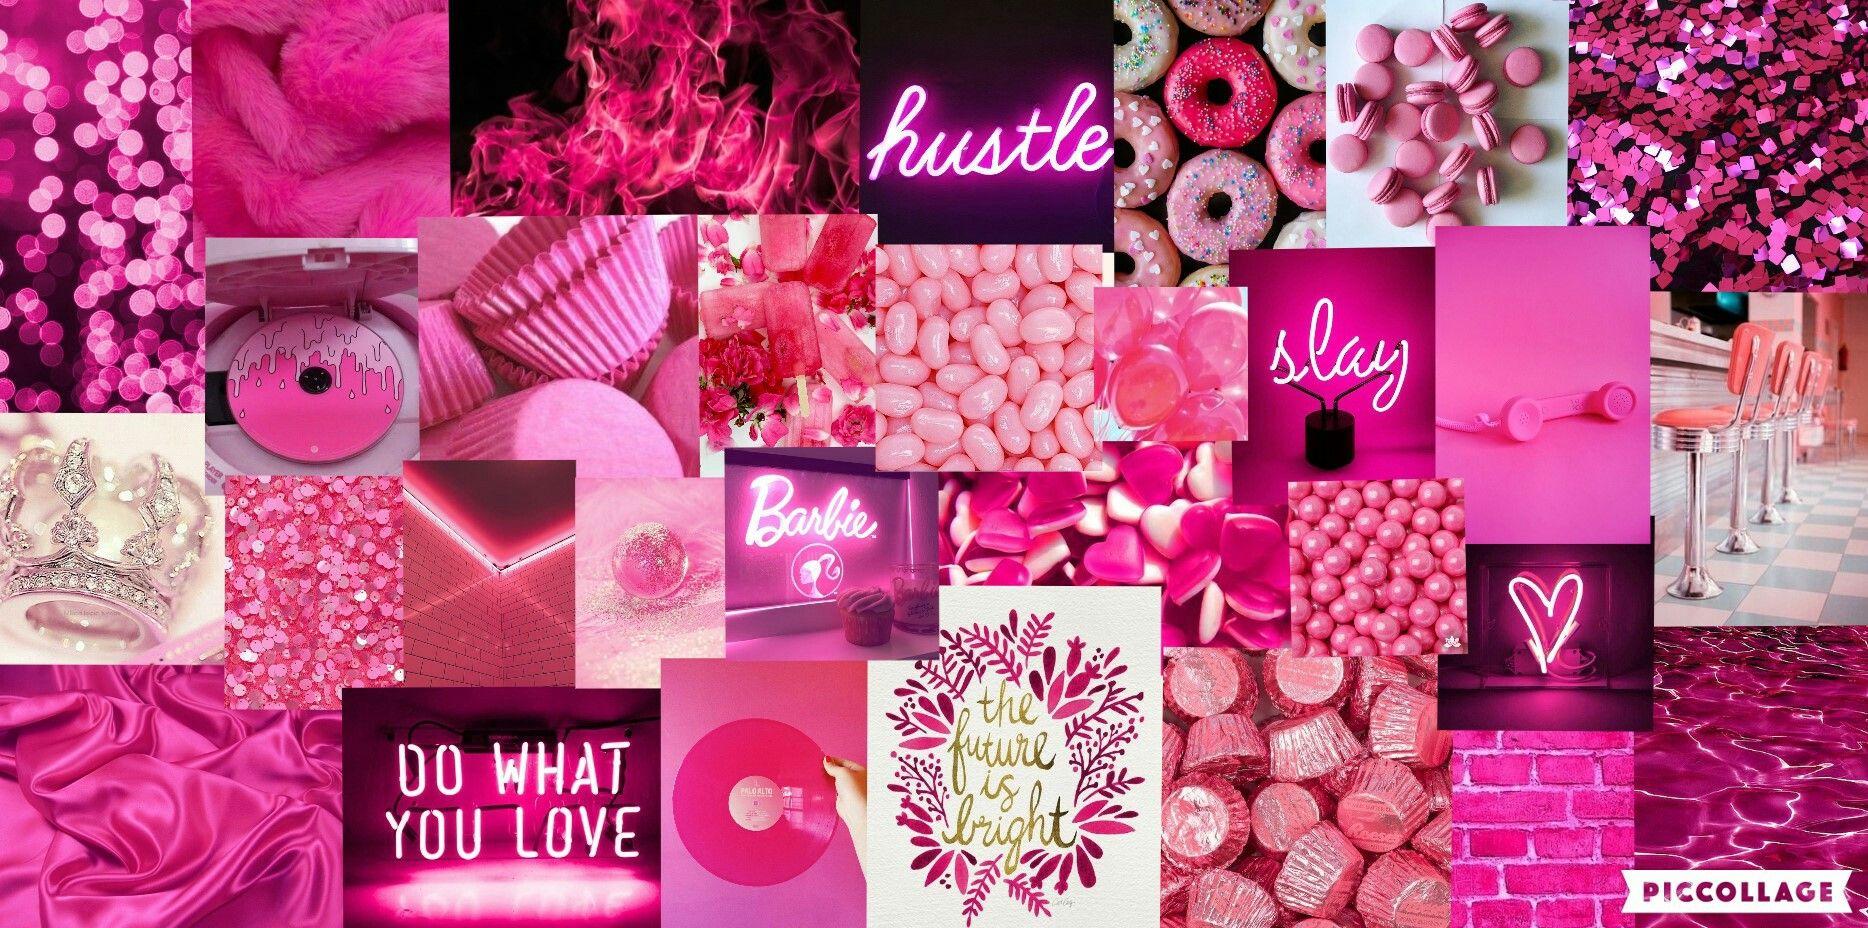 Hot Pink Mood Board Wallpaper Aesthetic Pink Wallpaper Laptop Pink Wallpaper Mac Hot Pink Wallpaper